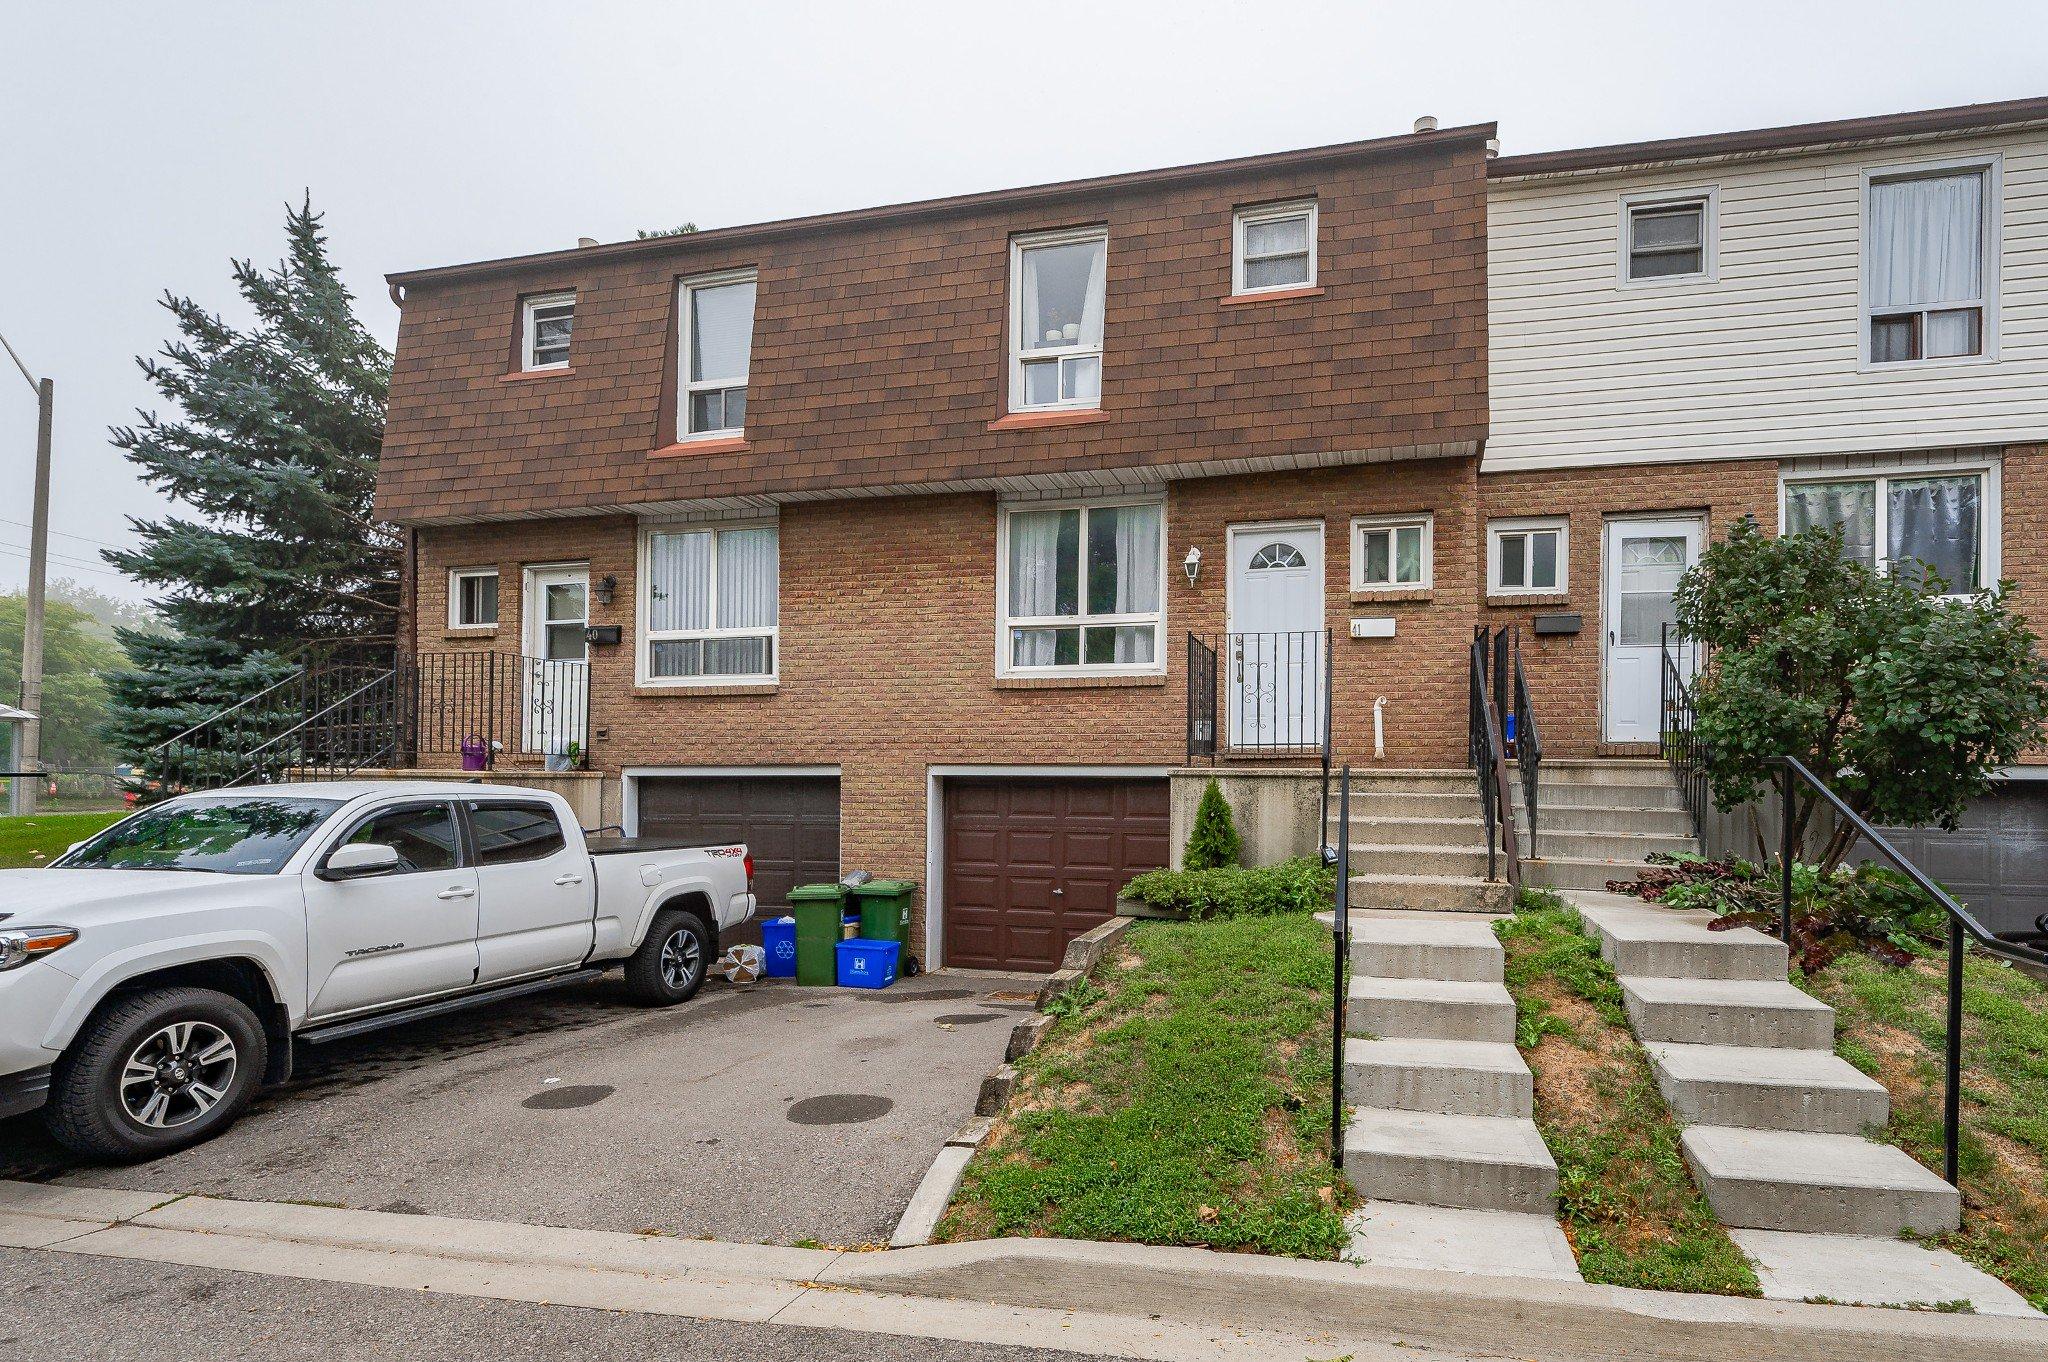 Main Photo: 41 17 Quail Drive in Hamilton: House for sale : MLS®# H4087772